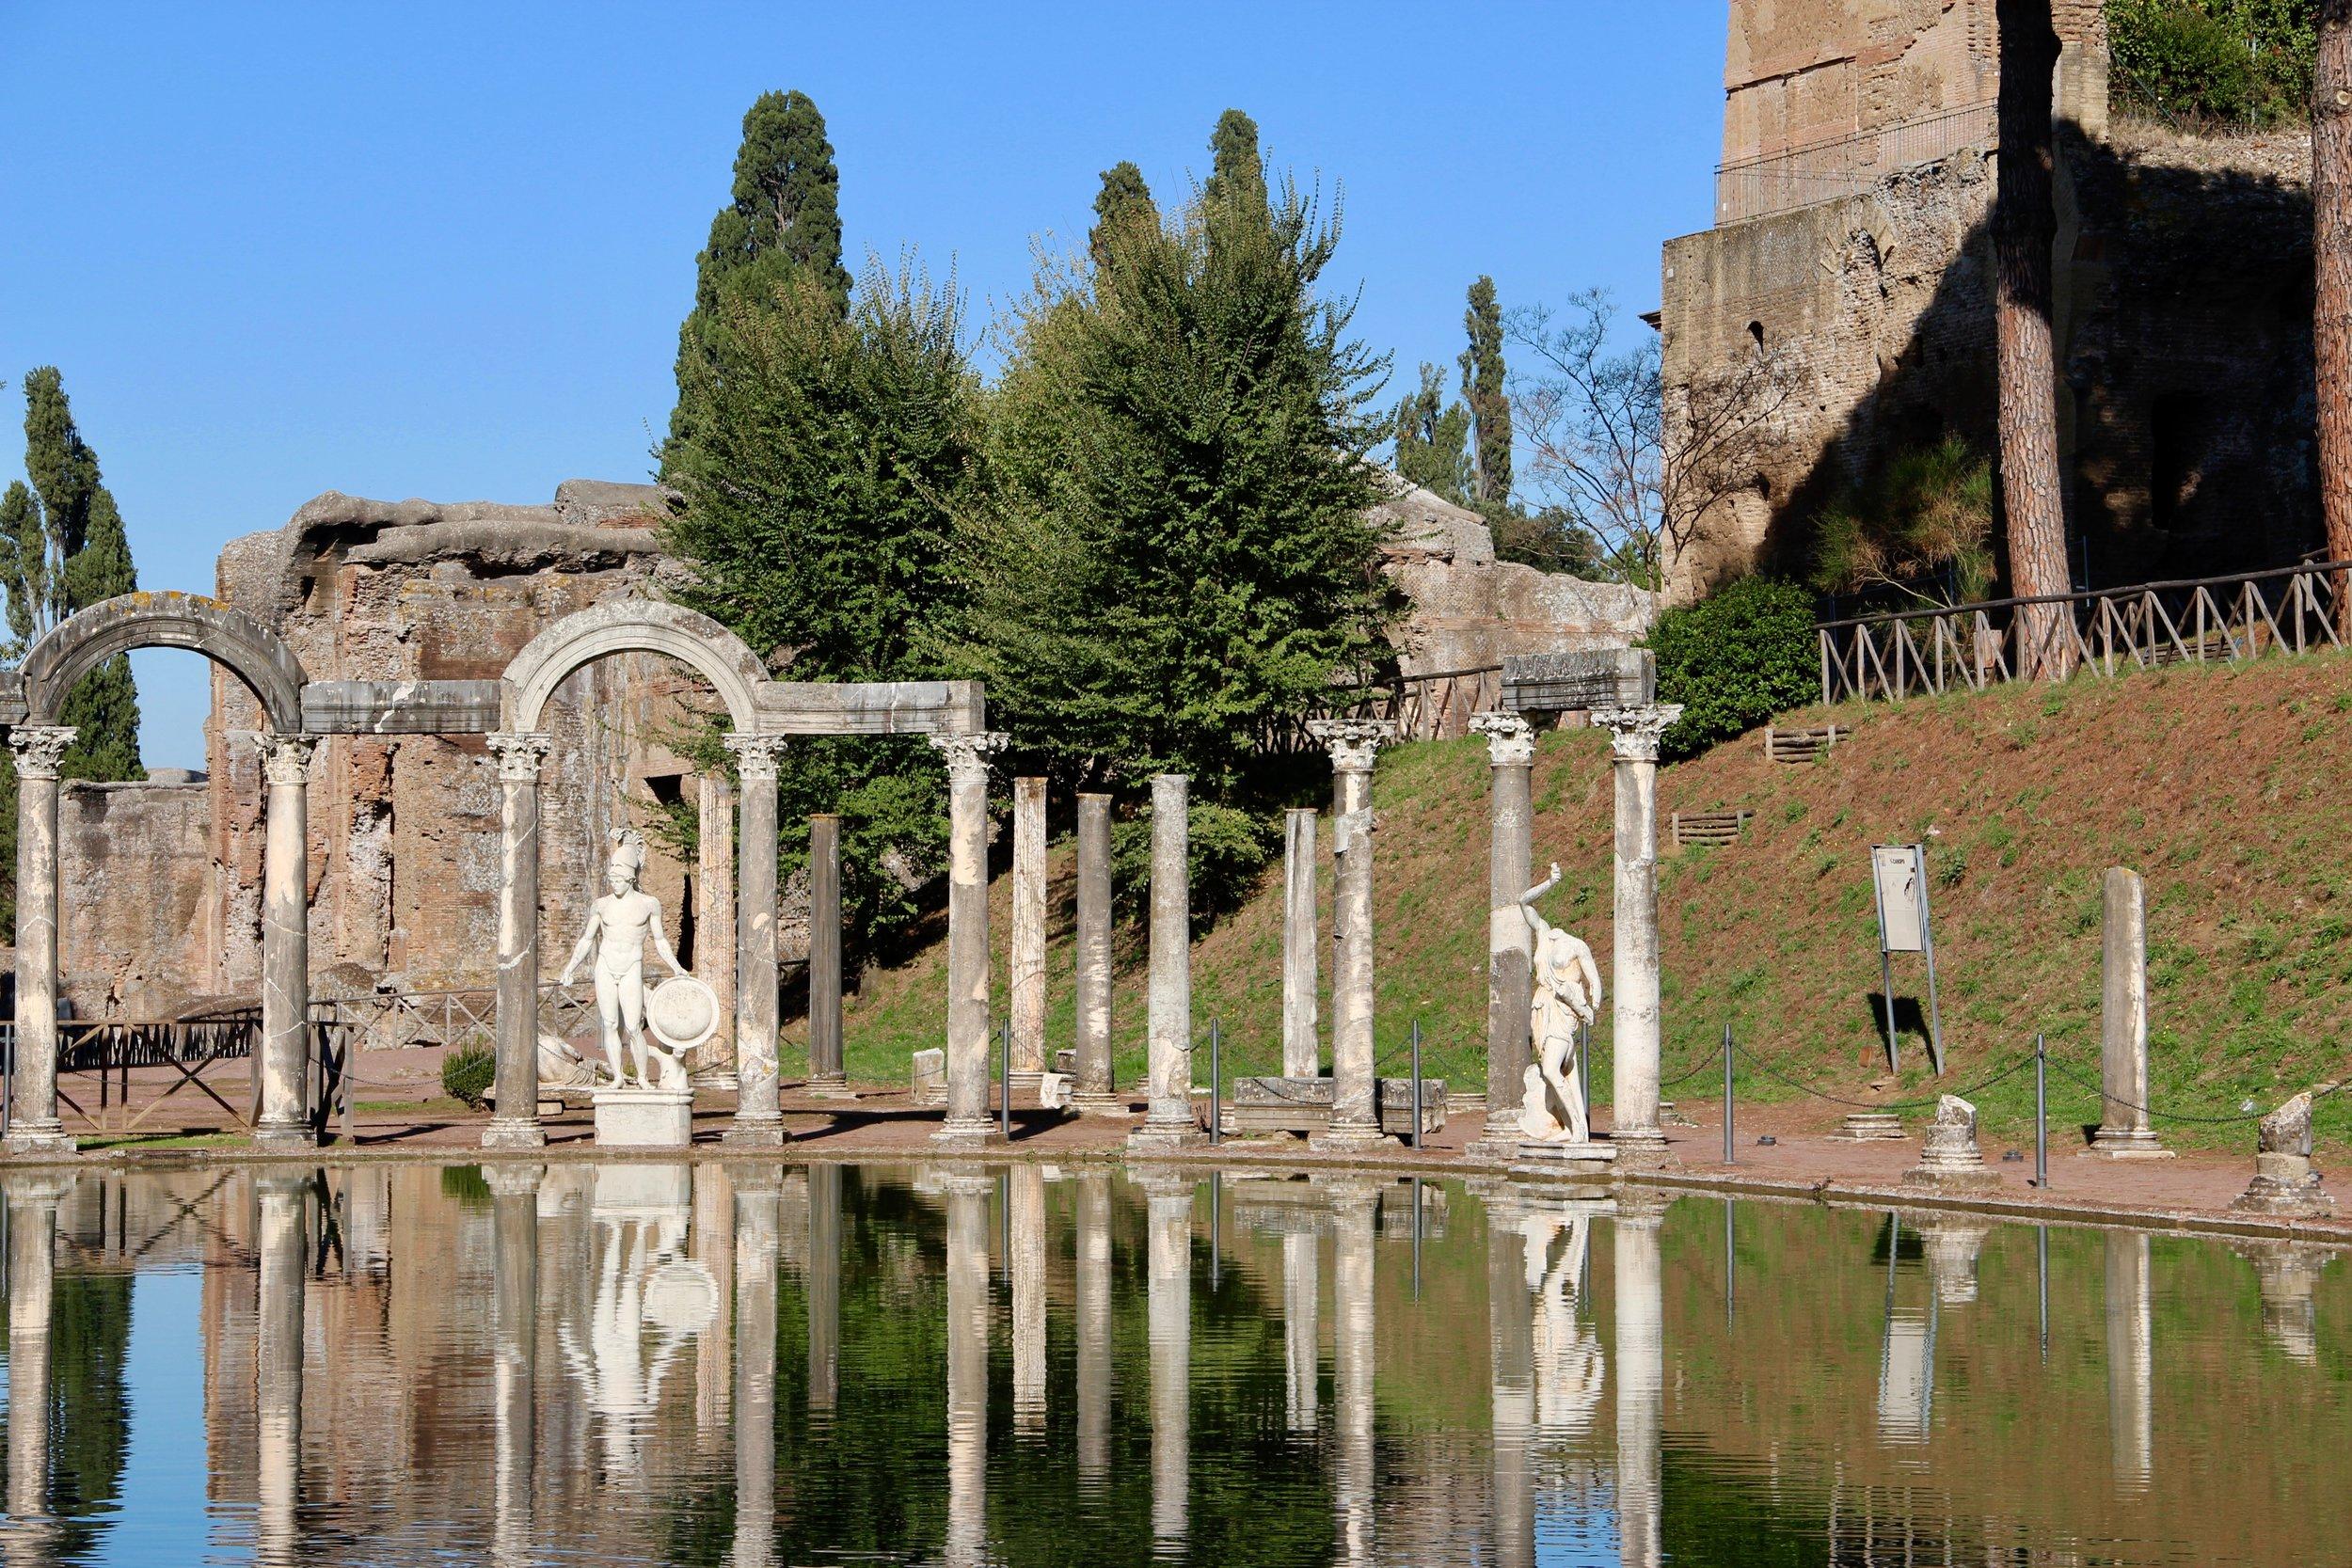 The pool at Hadrian's Villa